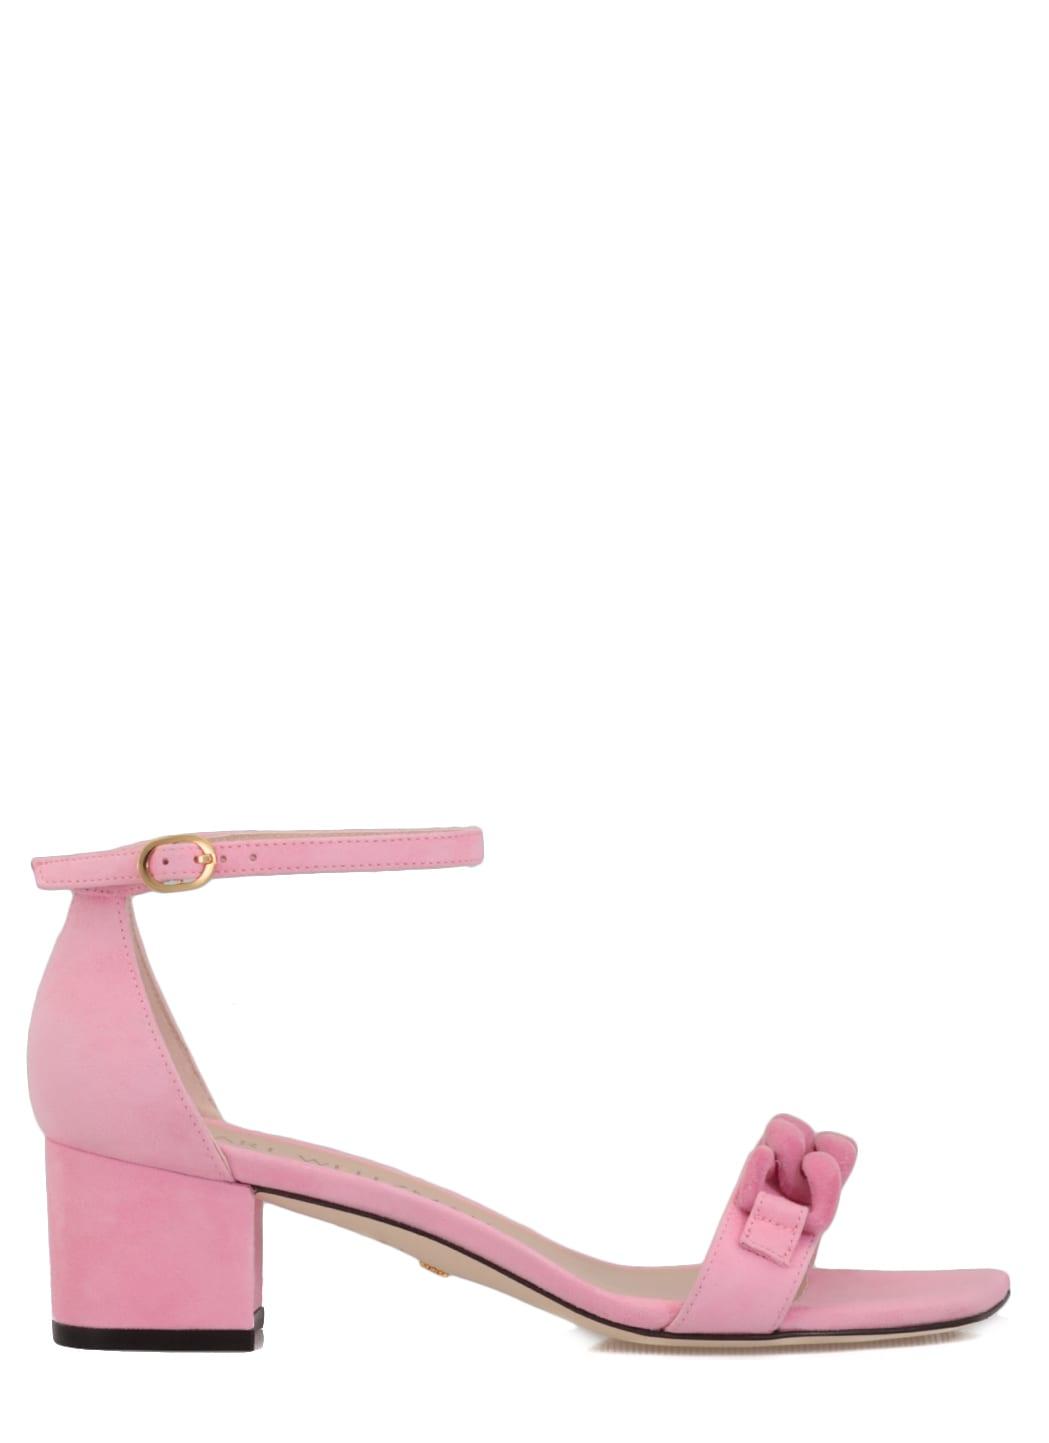 Buy Stuart Weitzman Amelina Sandal online, shop Stuart Weitzman shoes with free shipping